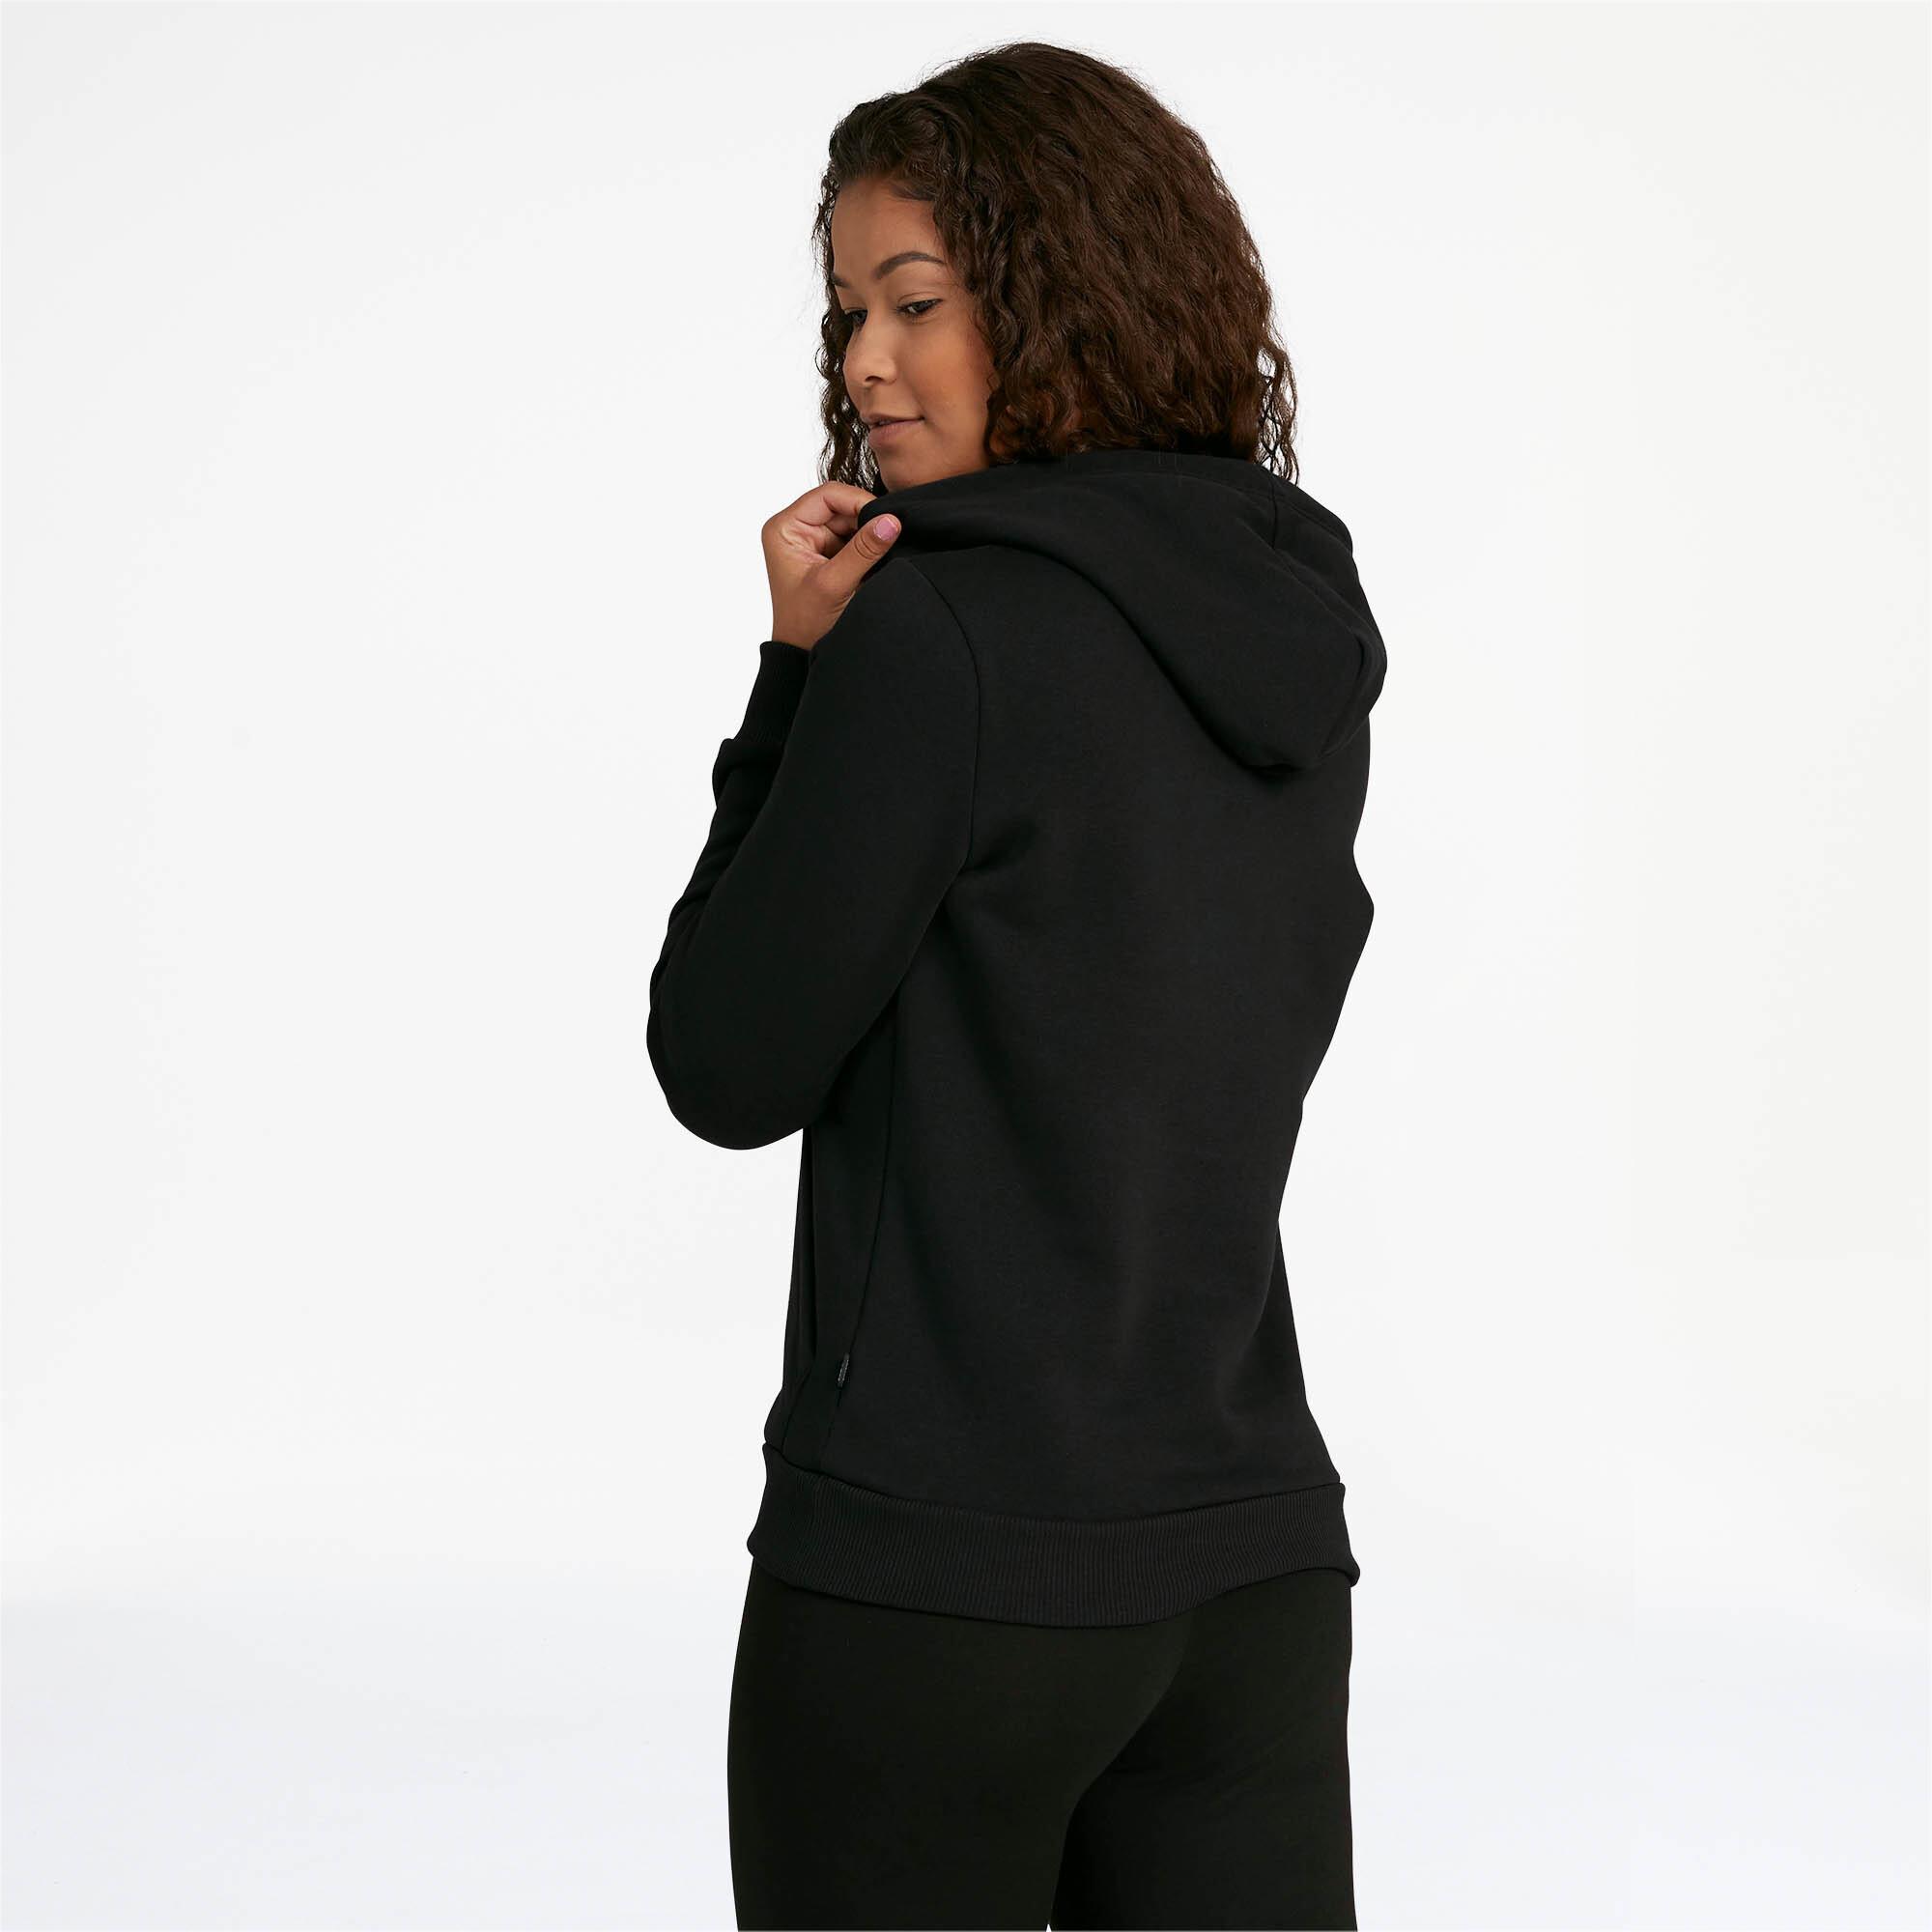 PUMA-Essentials-Women-039-s-Cropped-Hoodie-Women-Sweat-Basics thumbnail 9